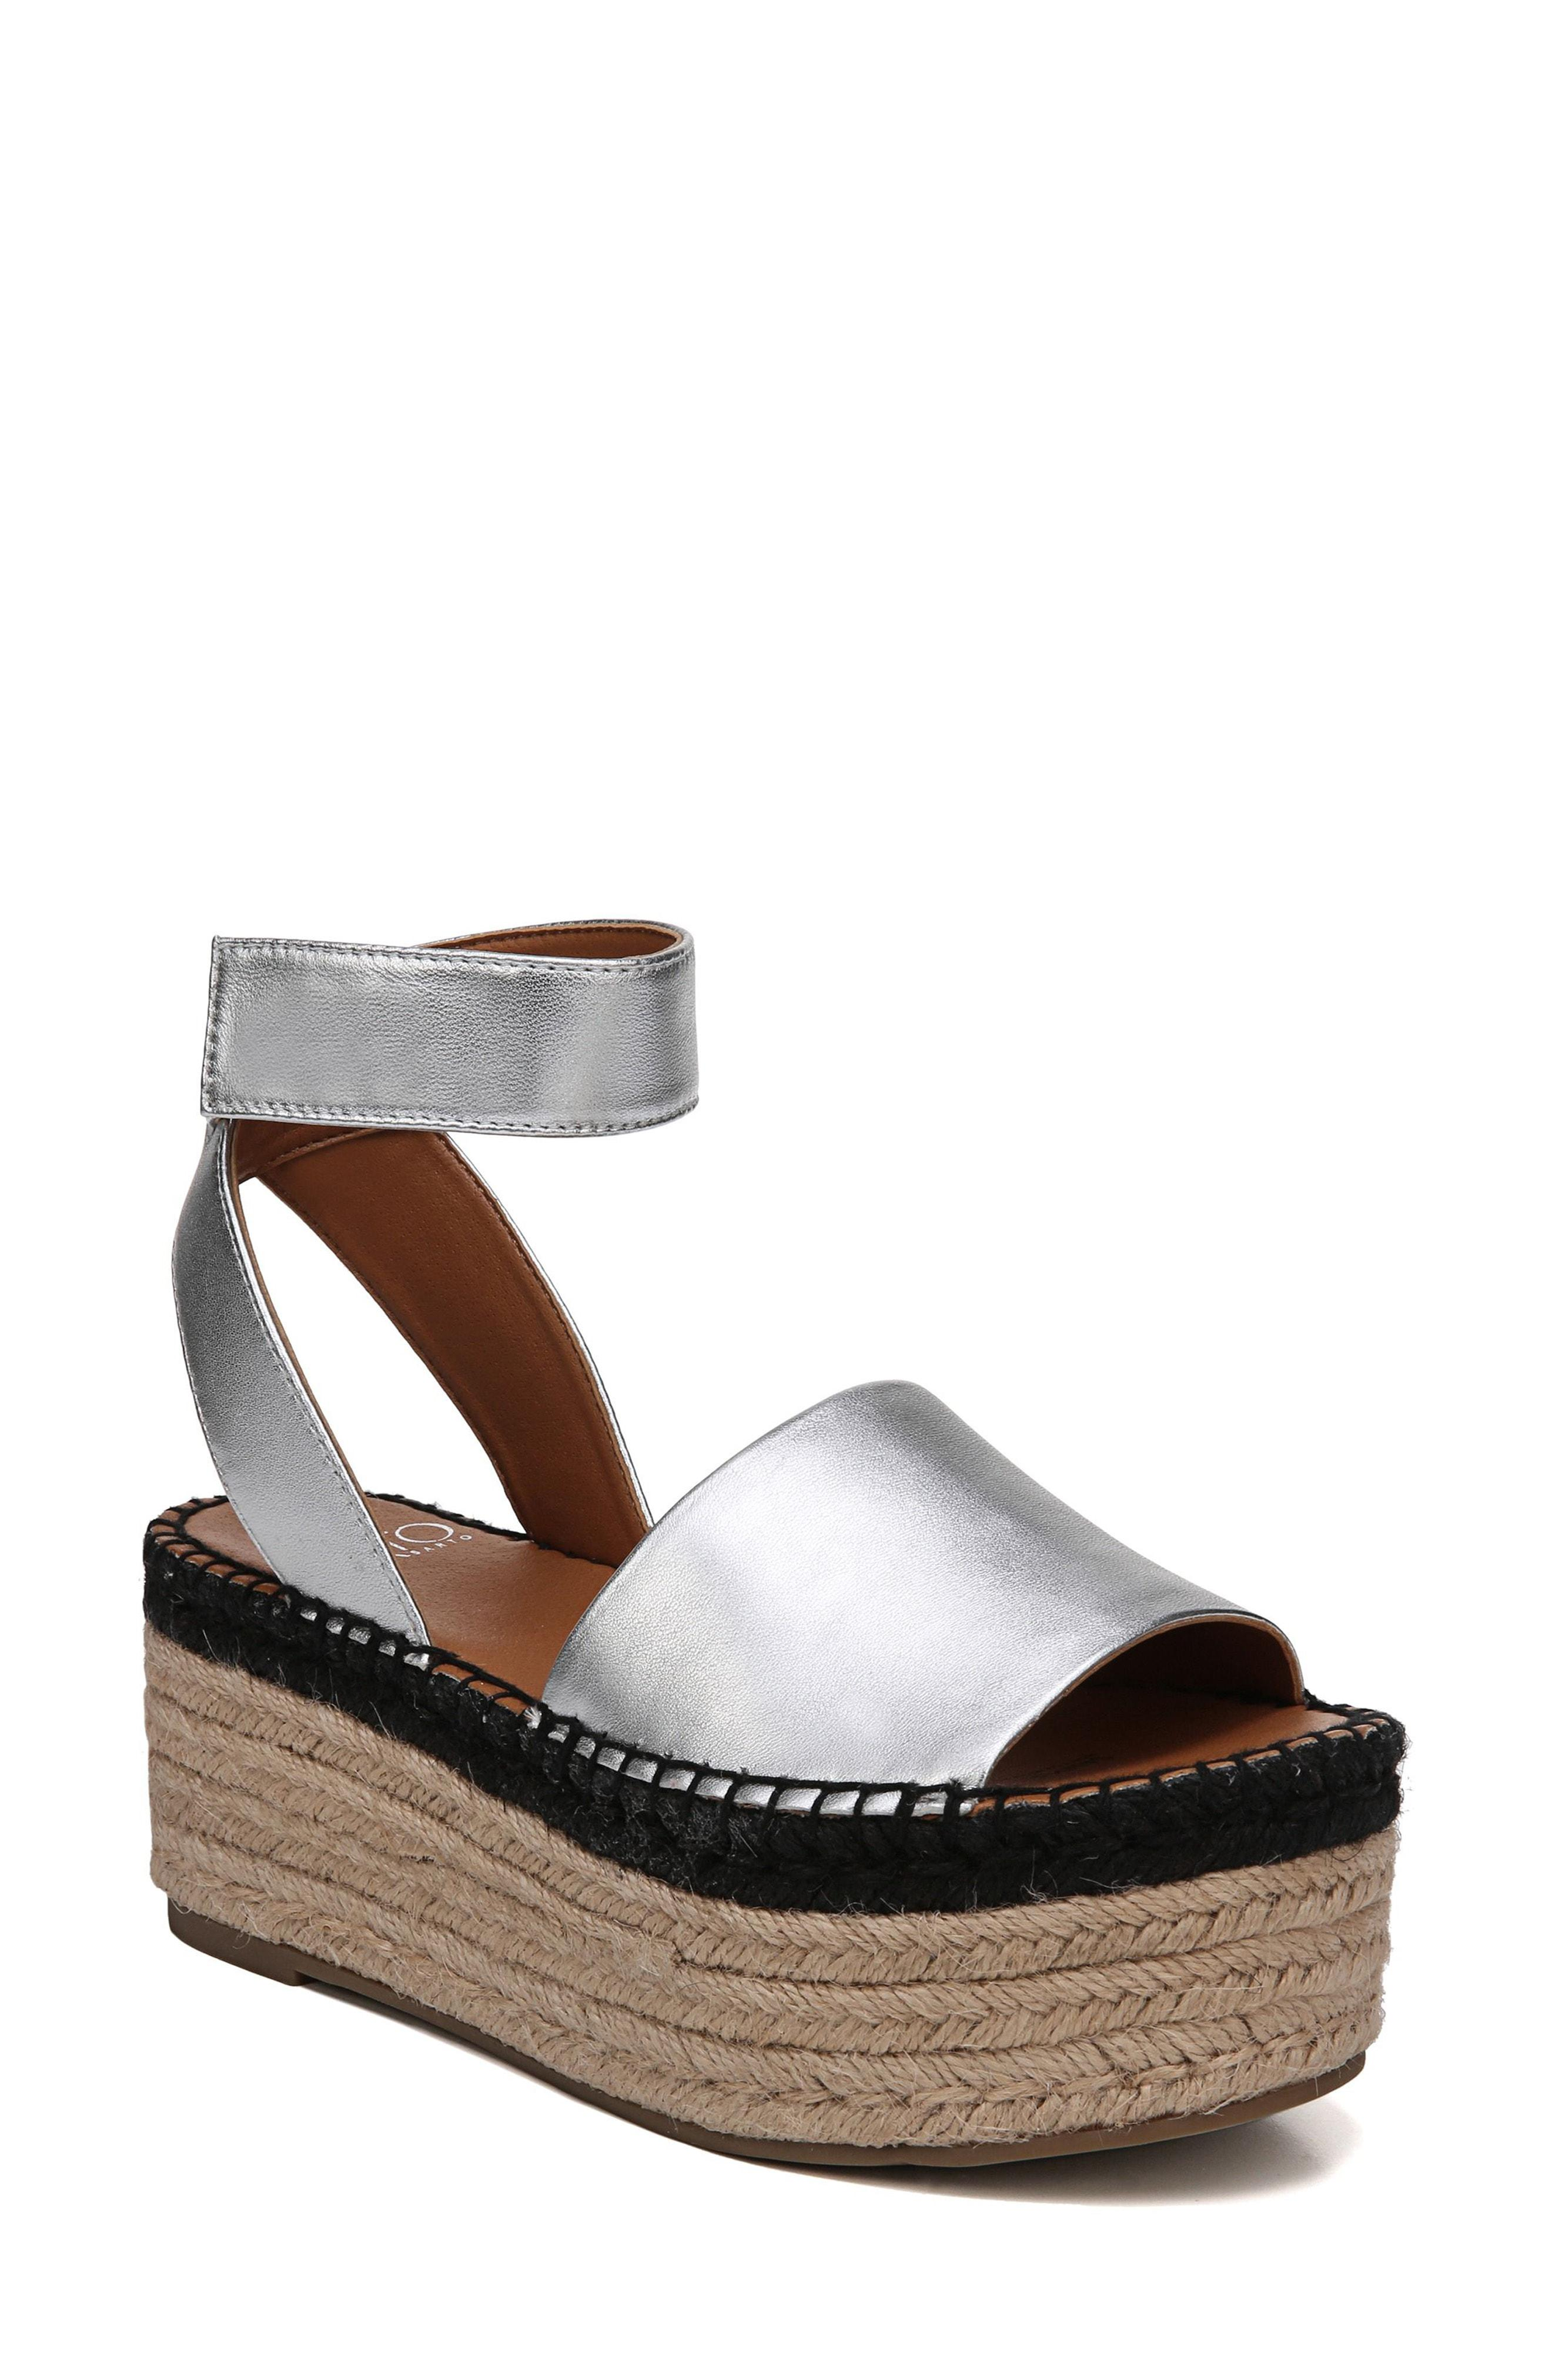 cd2f871c513 Lyst - Sarto Maisi Platform Espadrille Sandal in Metallic